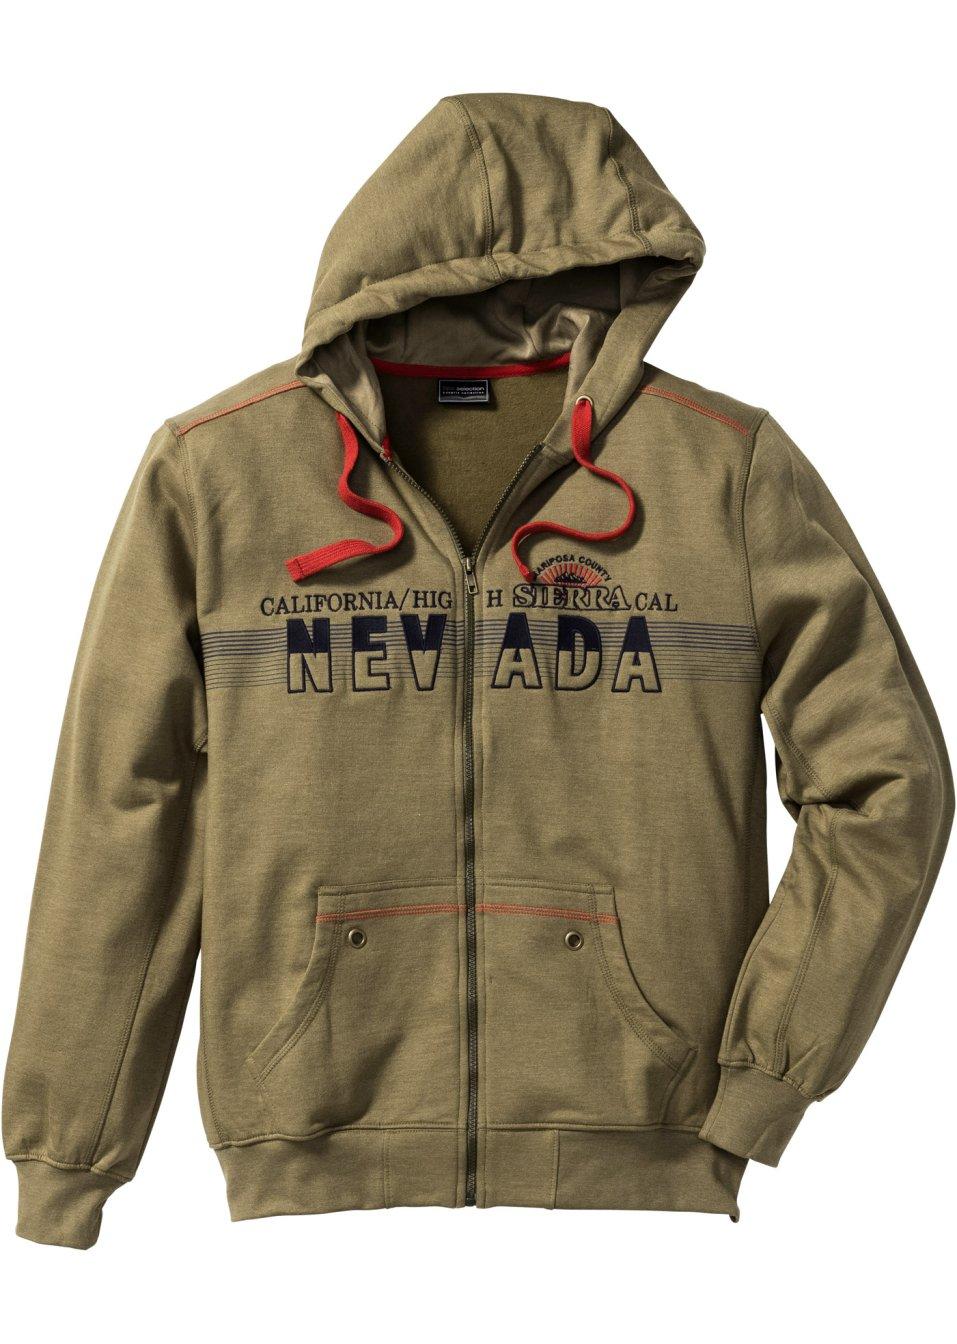 Sweat shirt capuche regular fit olive fonc chin for Sweaty t shirts and human mate choice